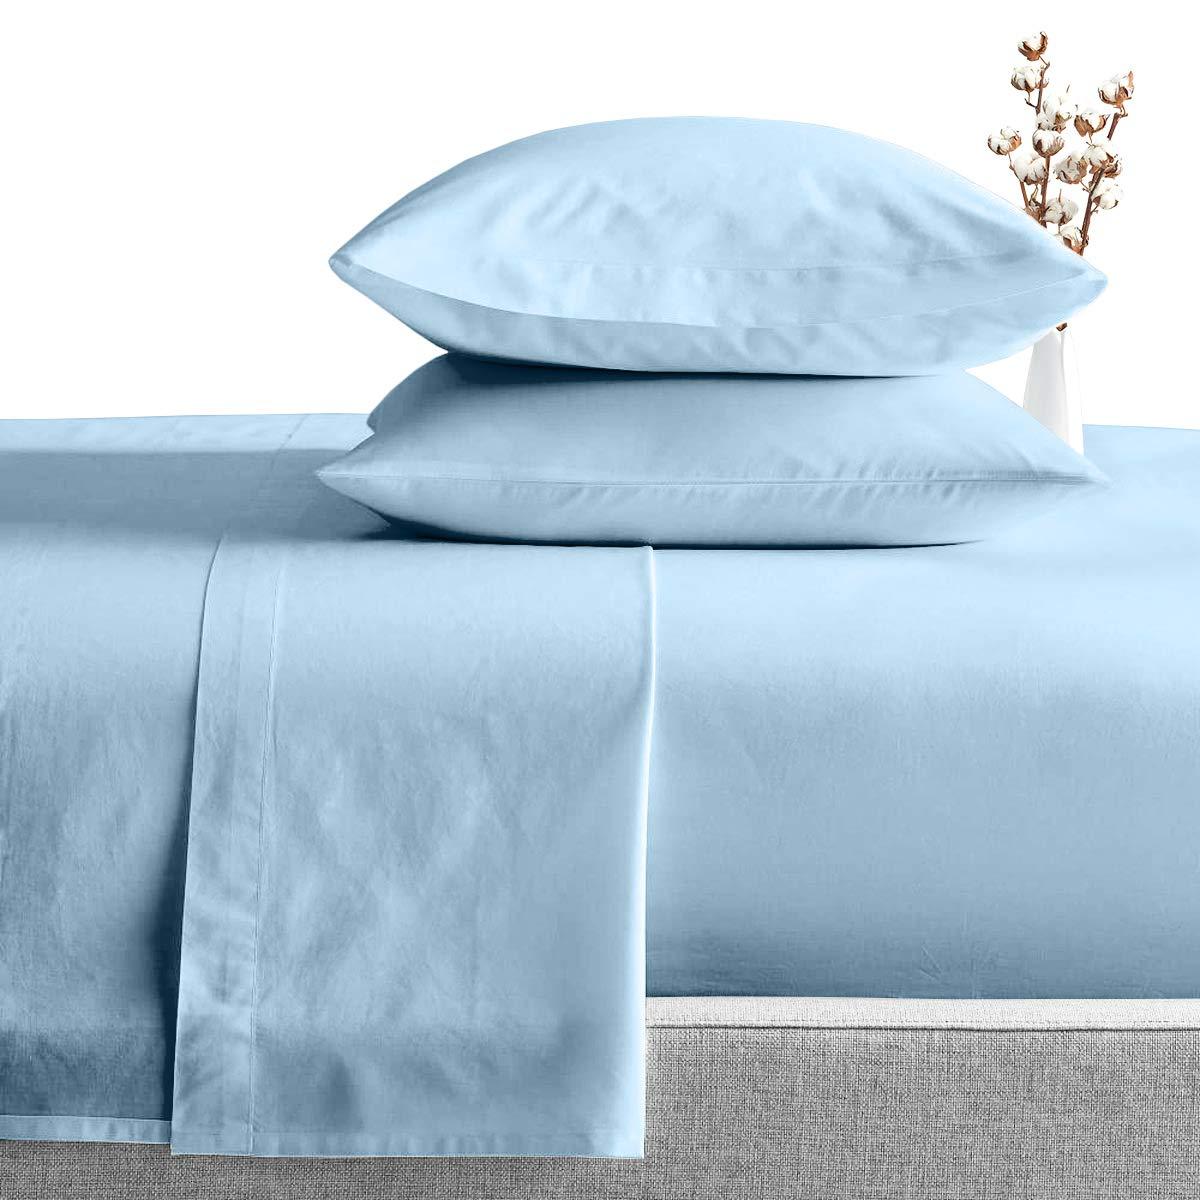 SGI bedding Three Quarter Sheets Luxury Soft 100% Egyptian Cotton - Sheet Set forThree Quarter Size 48x75 Light Blue Solid 600 Thread Count Deep Pocket